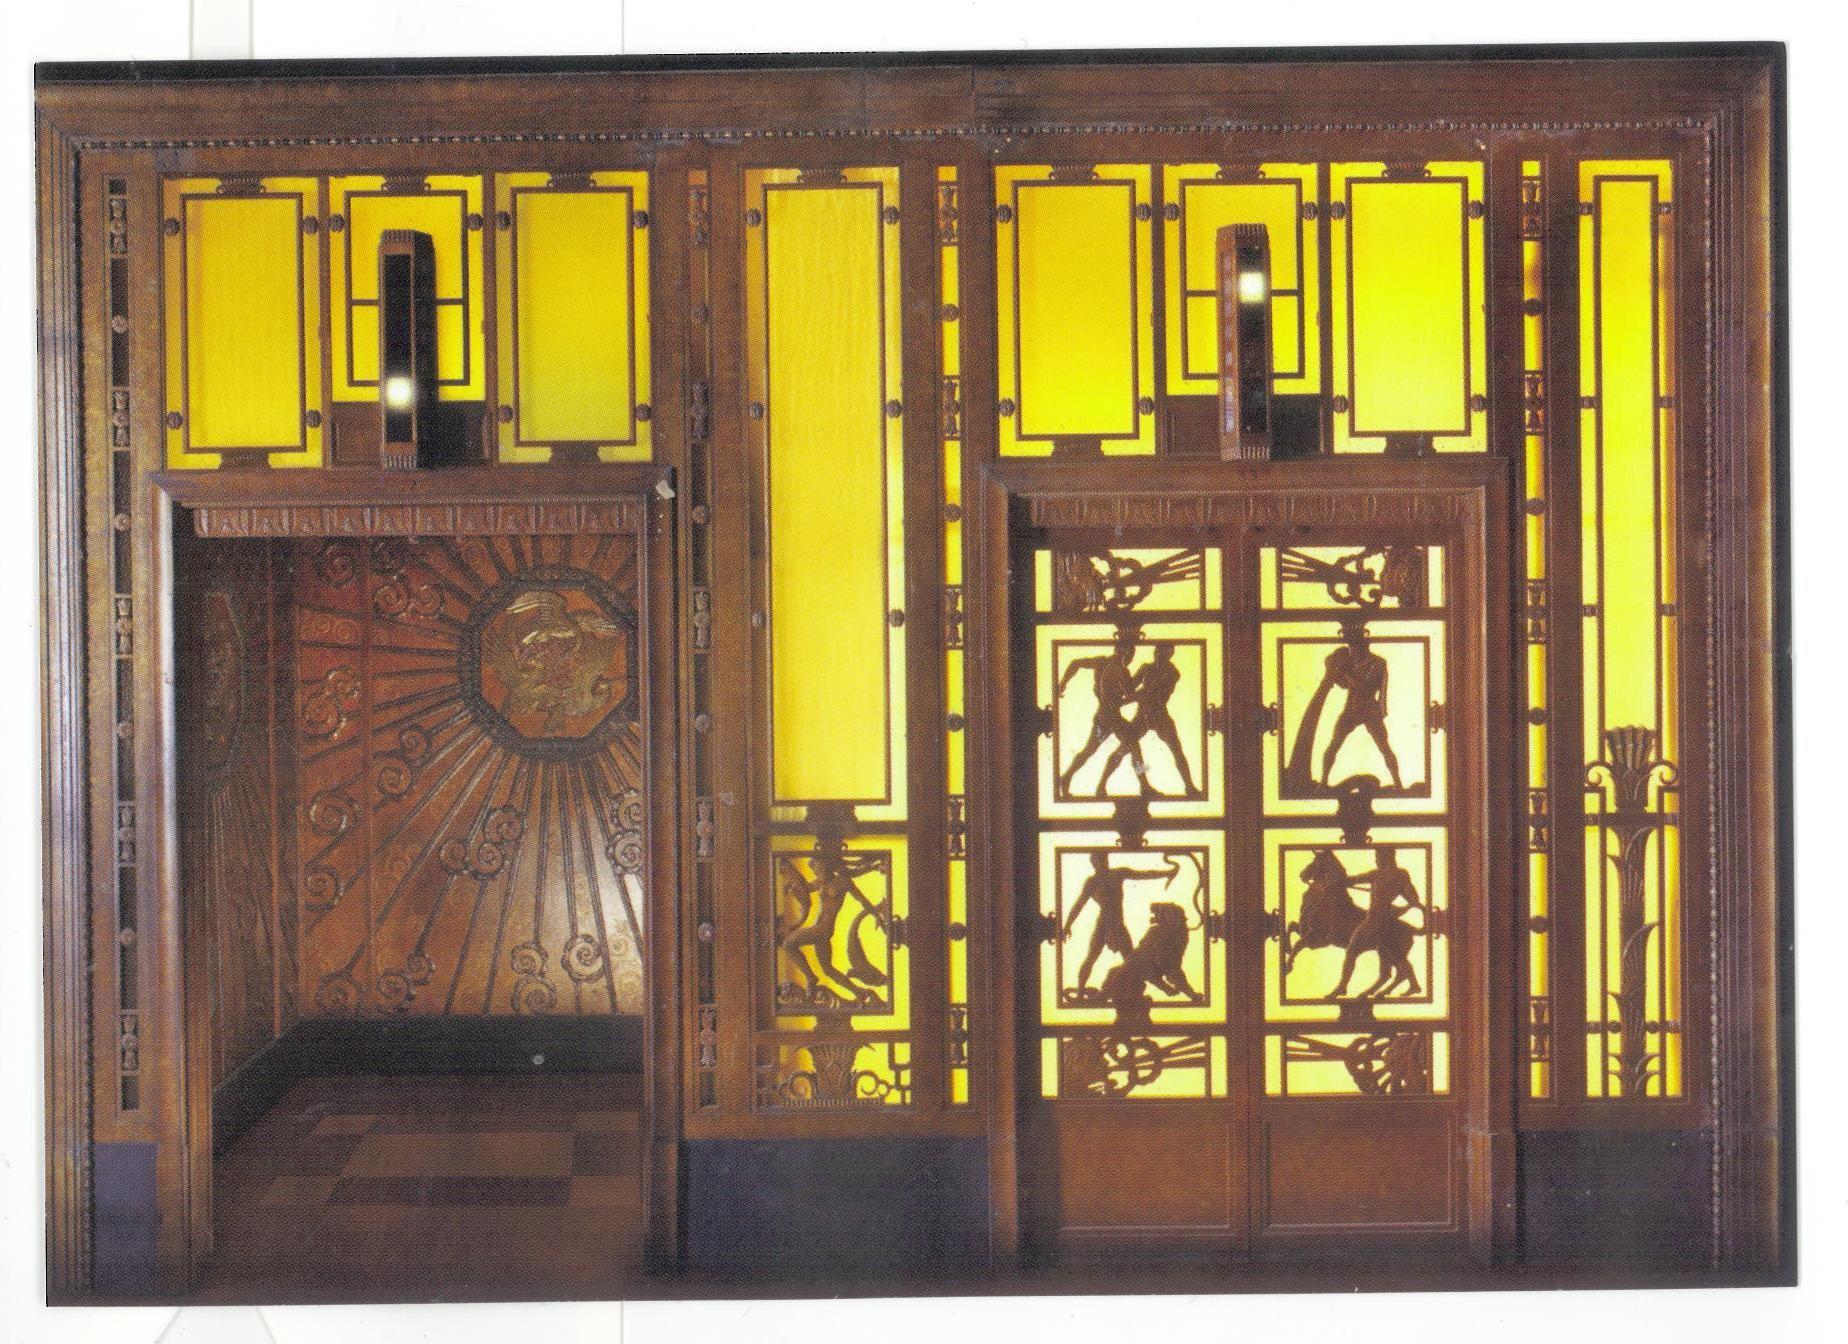 Selfridges store lift 1928 by edgar william brandt